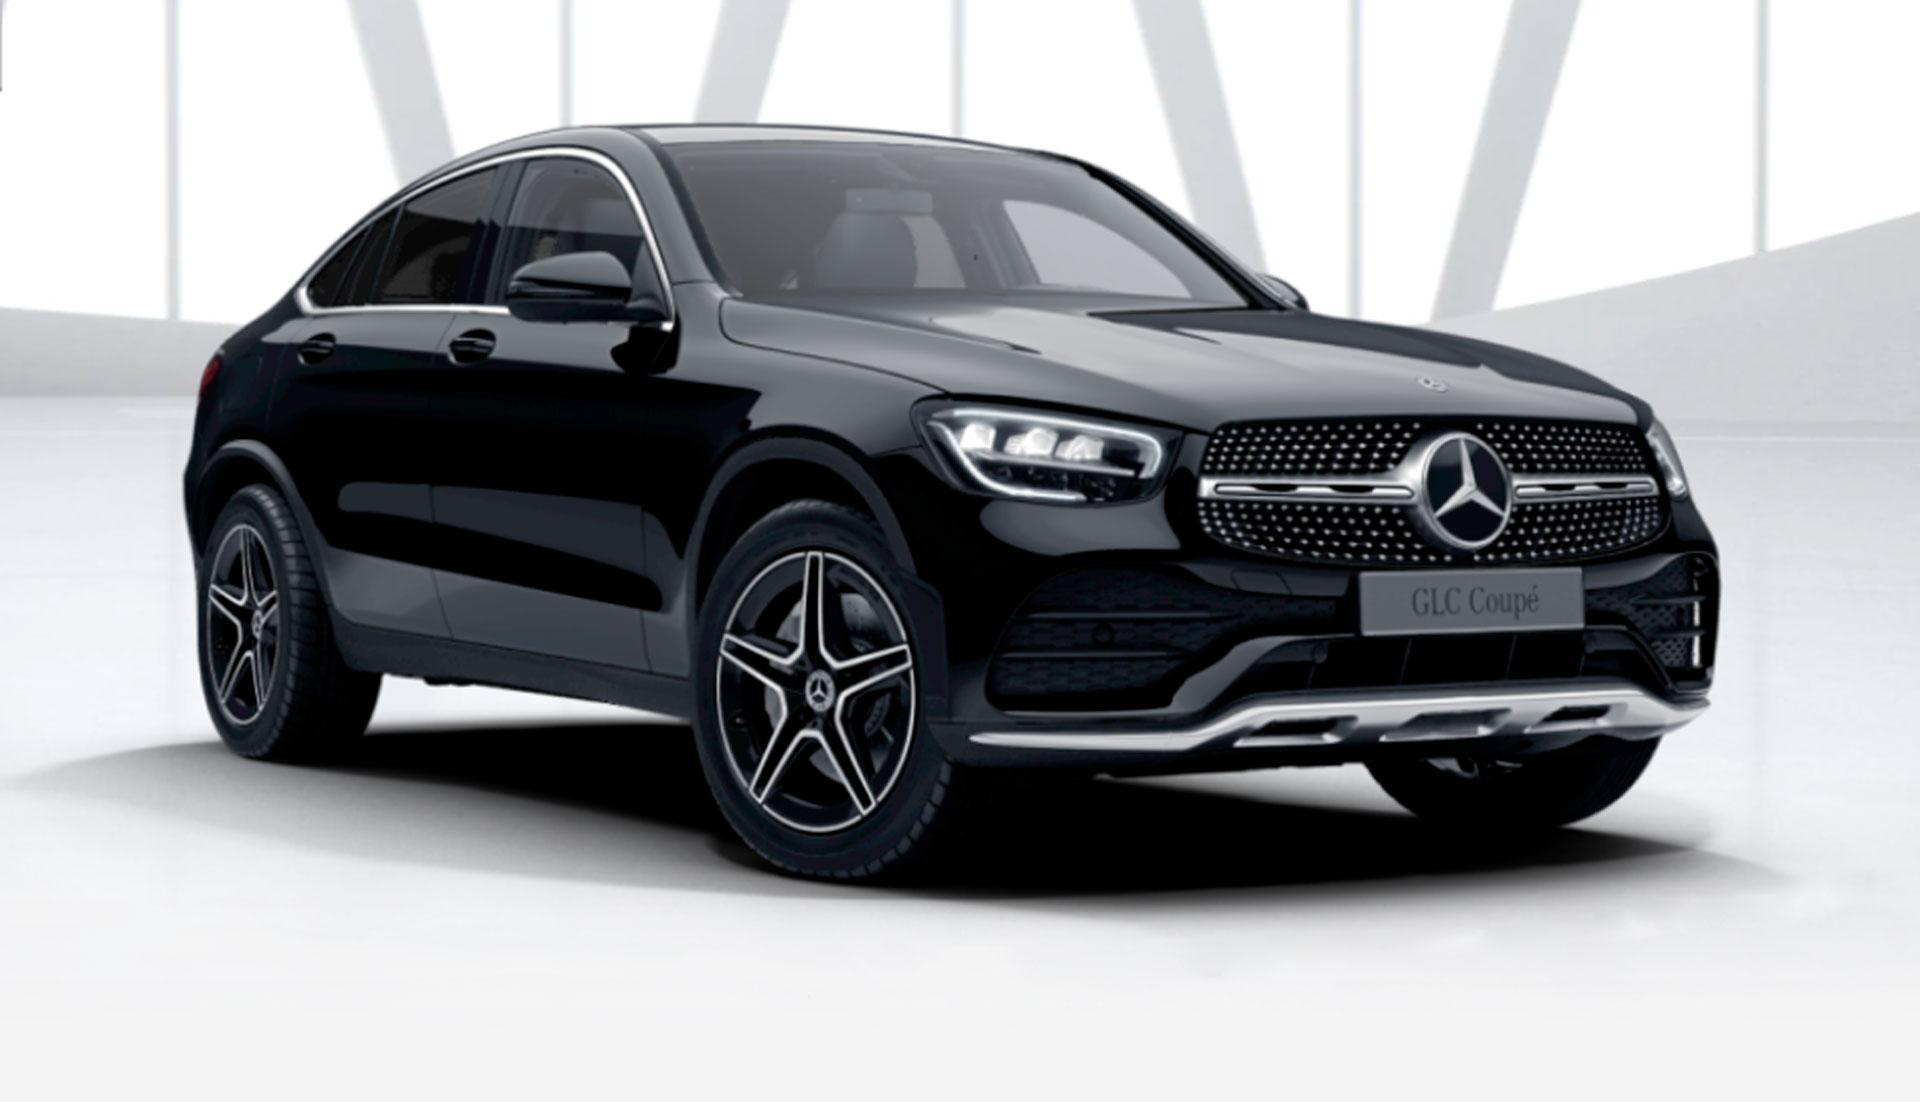 Mercedes-Benz GLC Coupe  0152623122